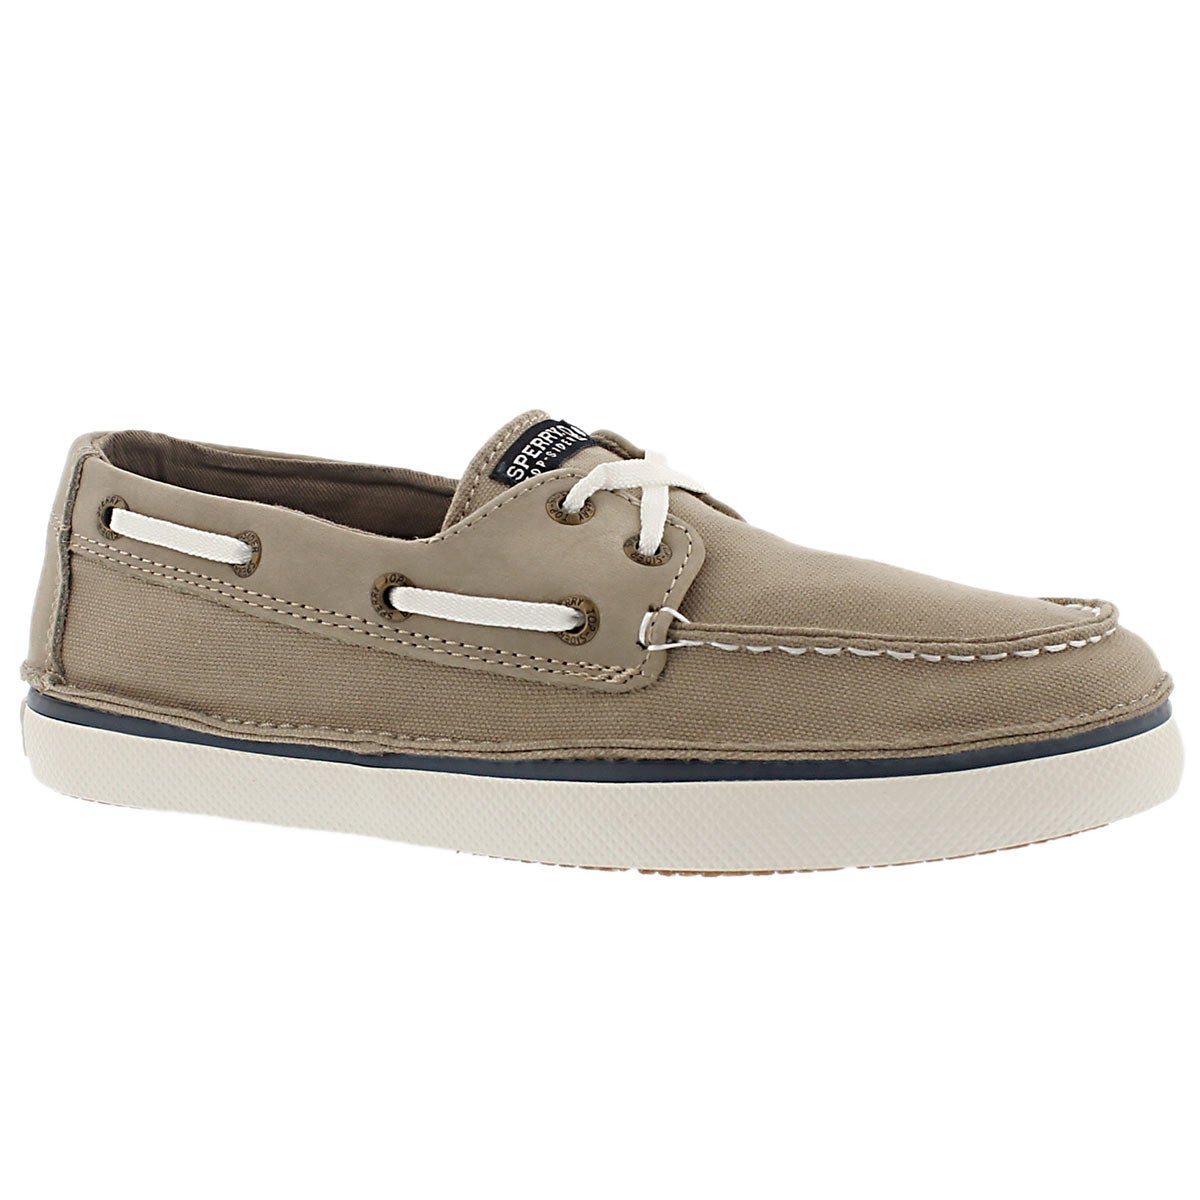 Bys Cruz khaki boat shoe